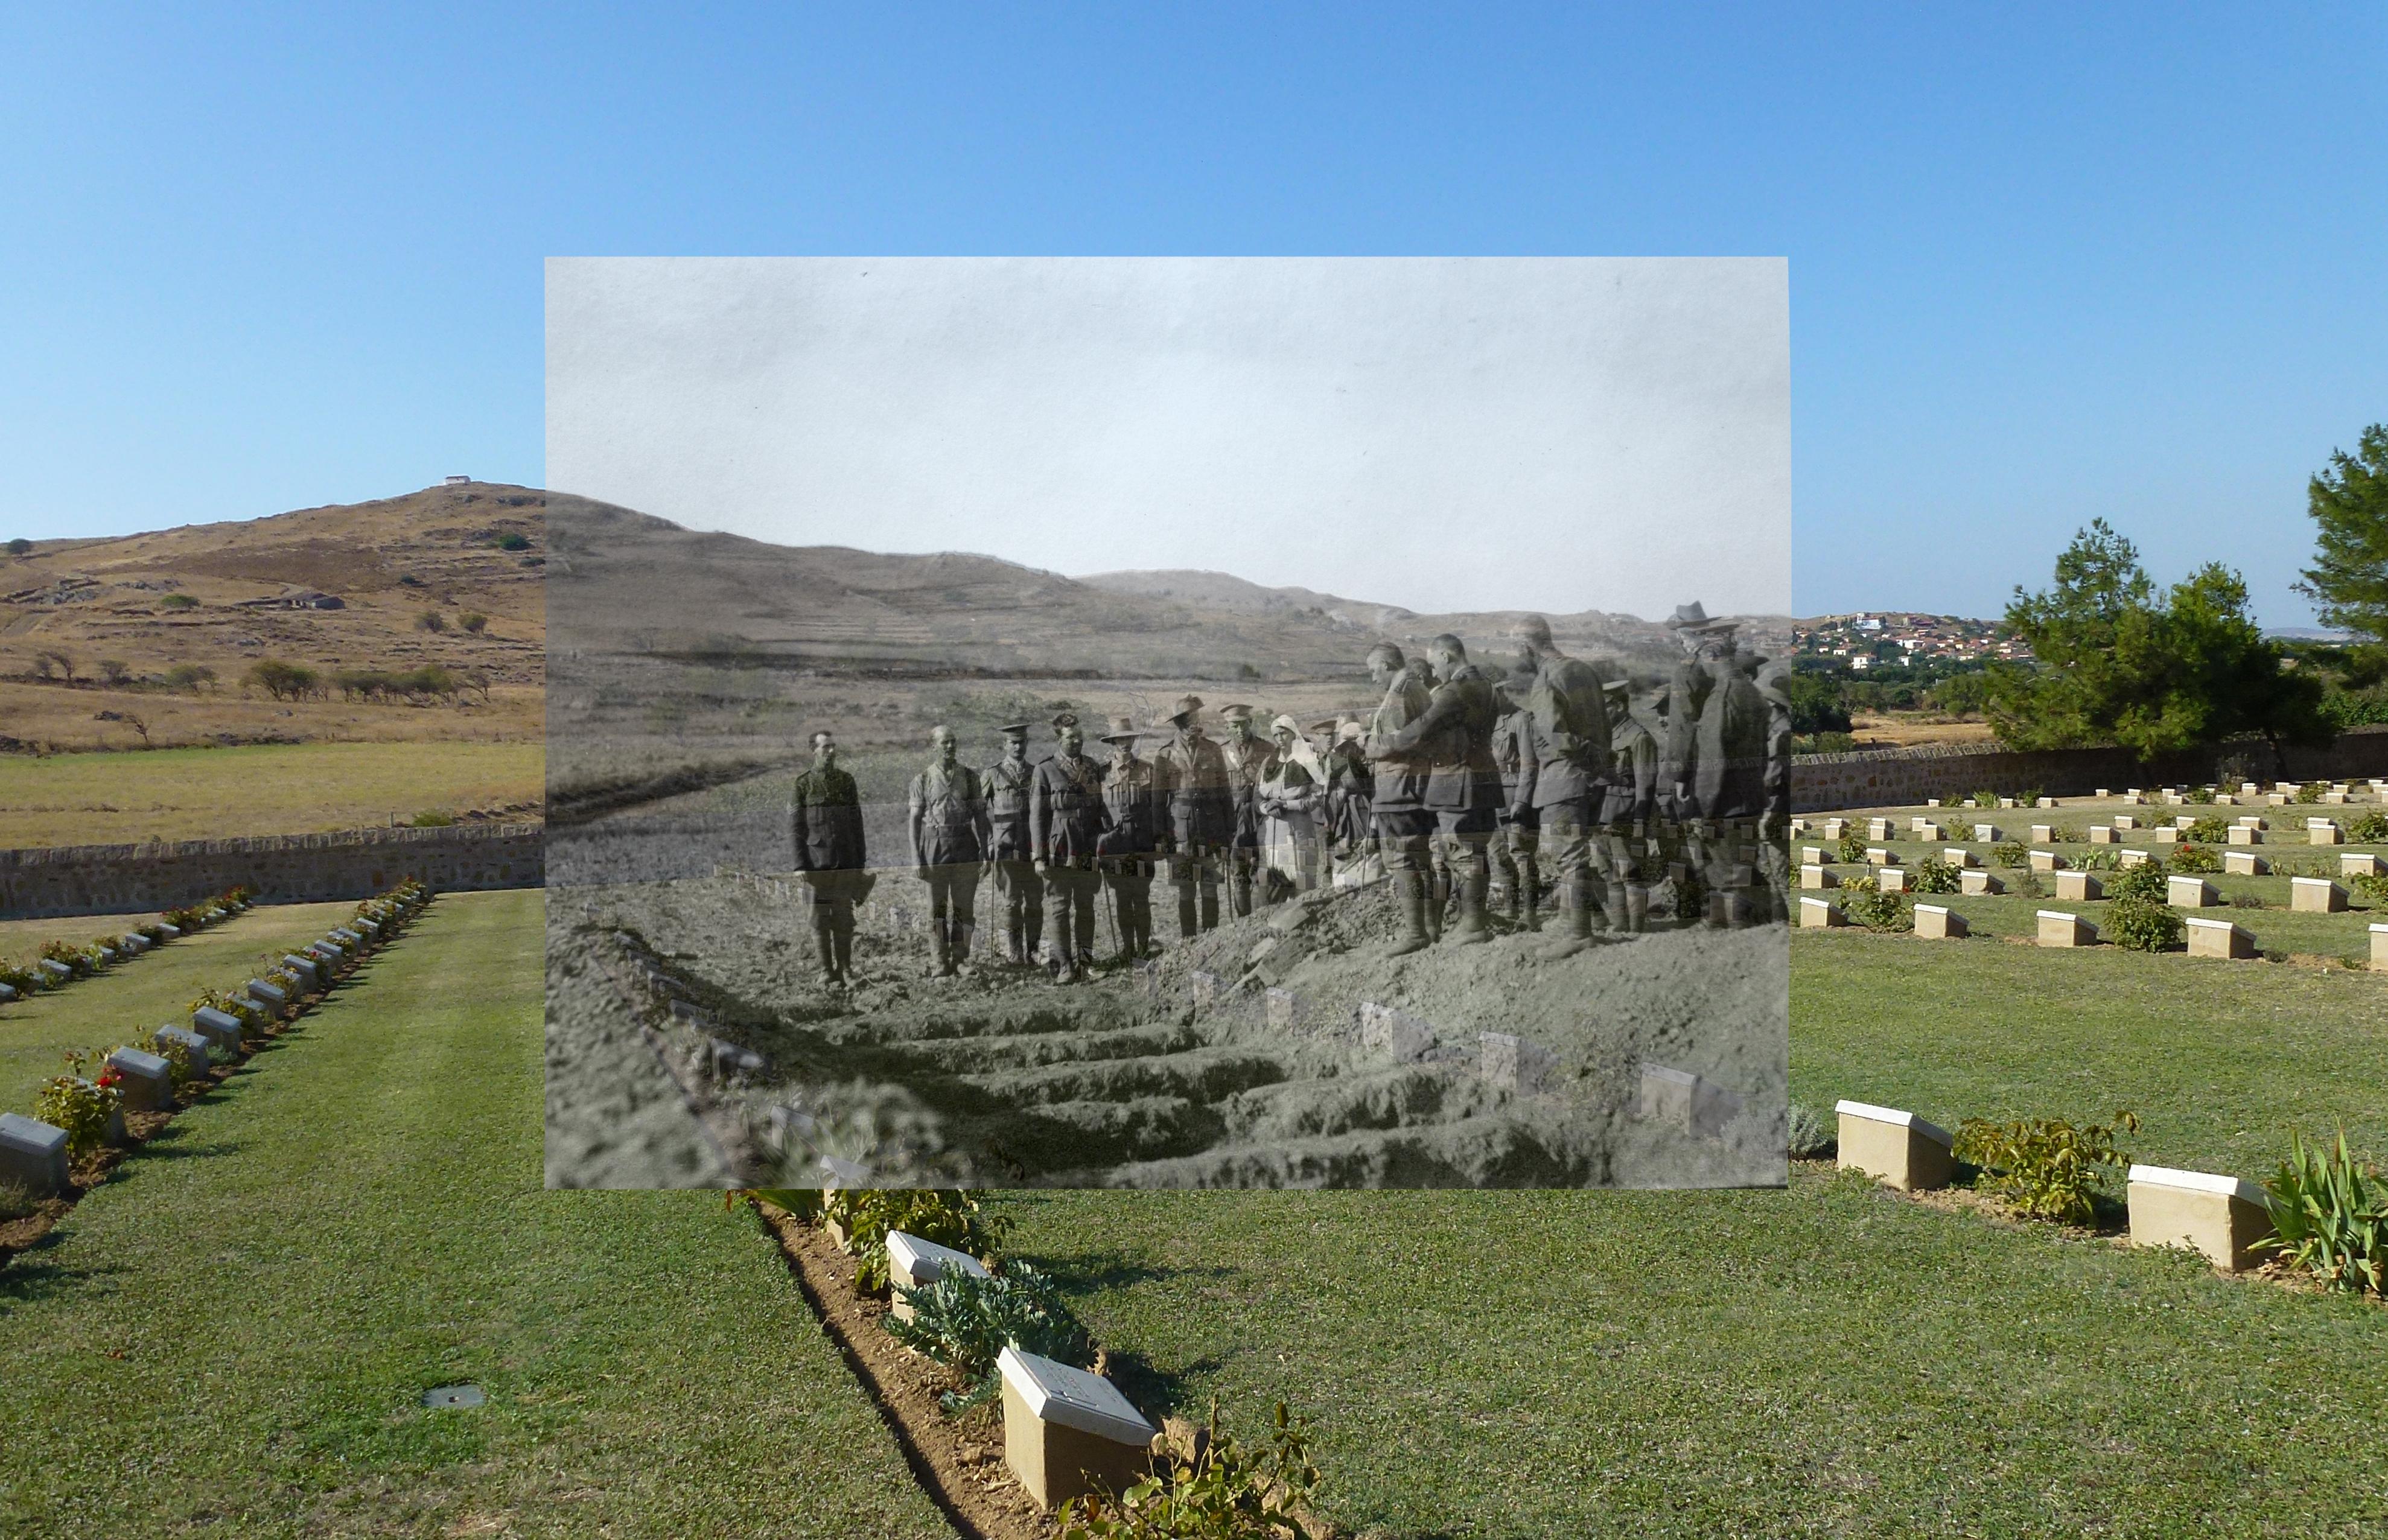 Newfoundland 'Canadians' at Gallipoli  Remember Them